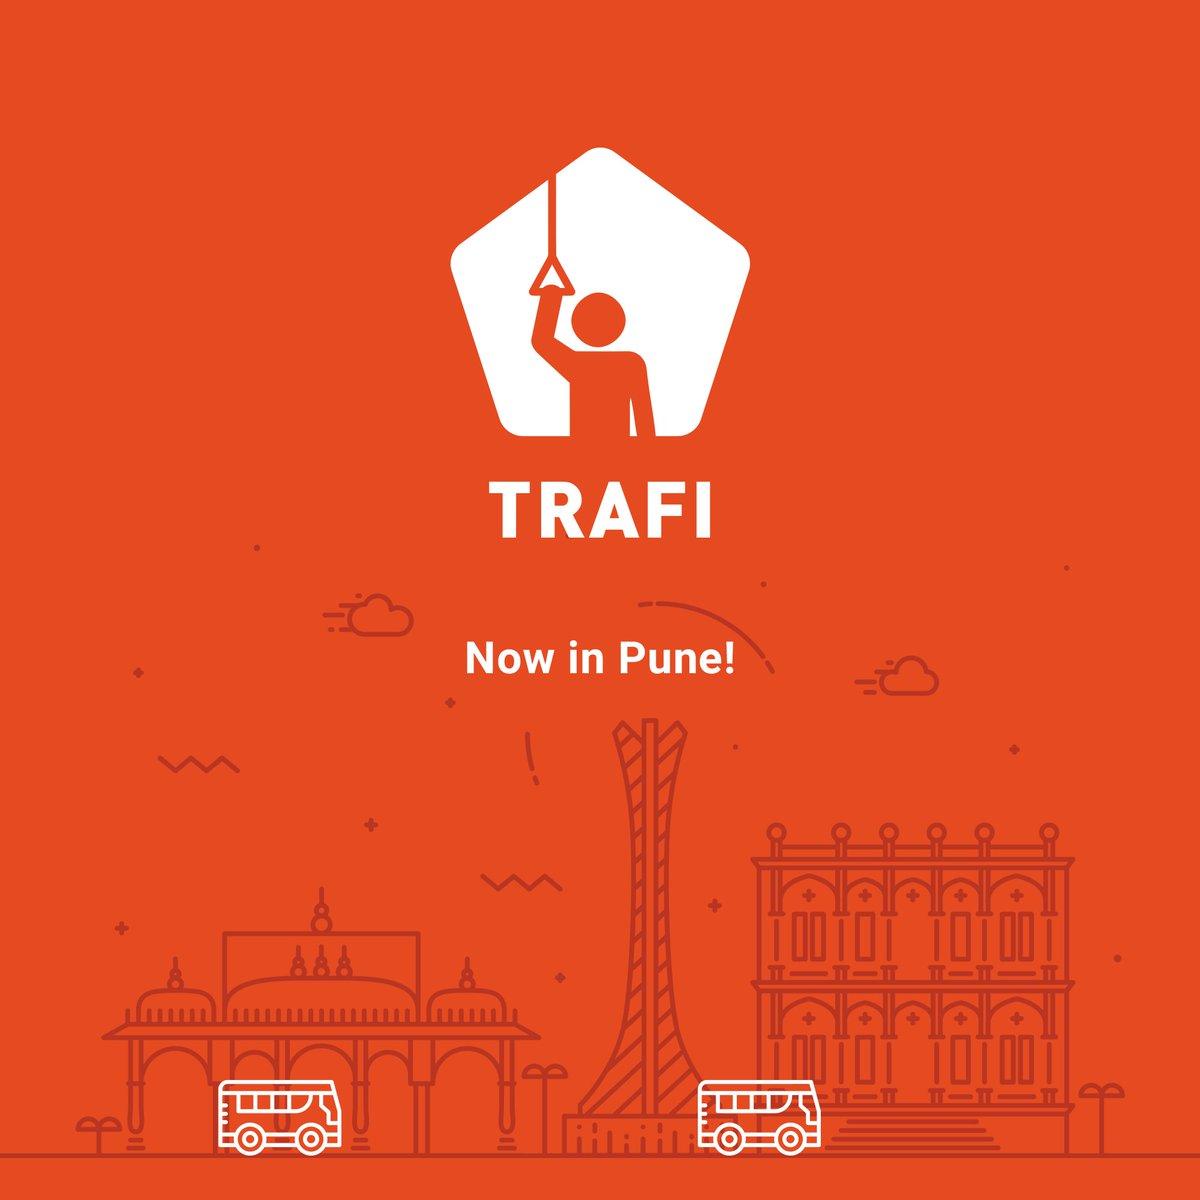 Namasthae! We are live now in PUNE, India! #Trafi #Trafiapp #app #Pune #India #publictransit https://t.co/w3pYtmAnHc